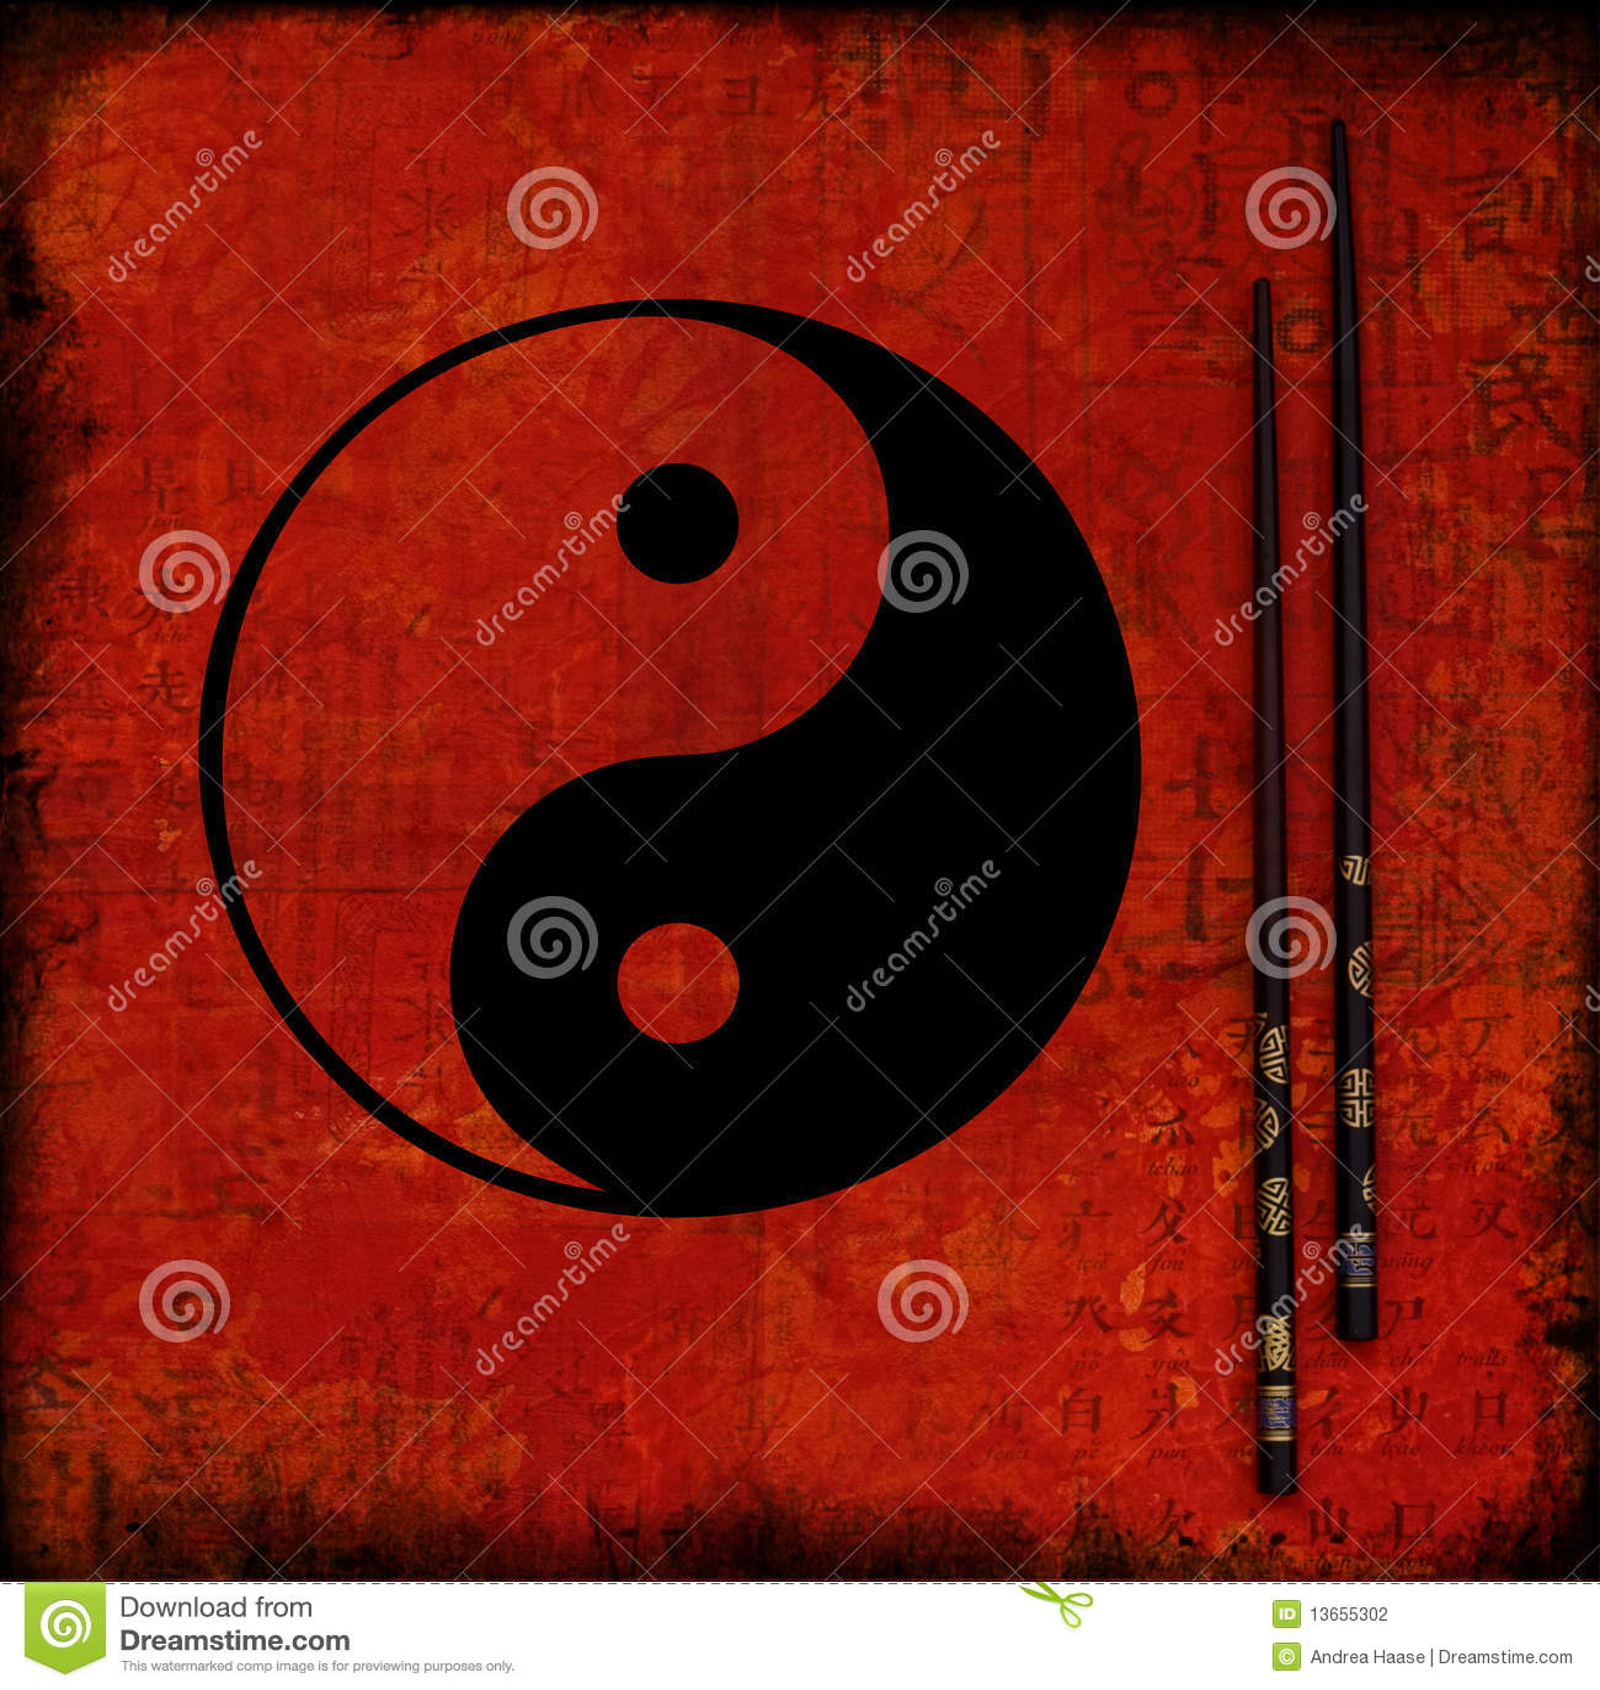 Collage Artwork Ying Yang Stock Illustration Illustration Of Symbol